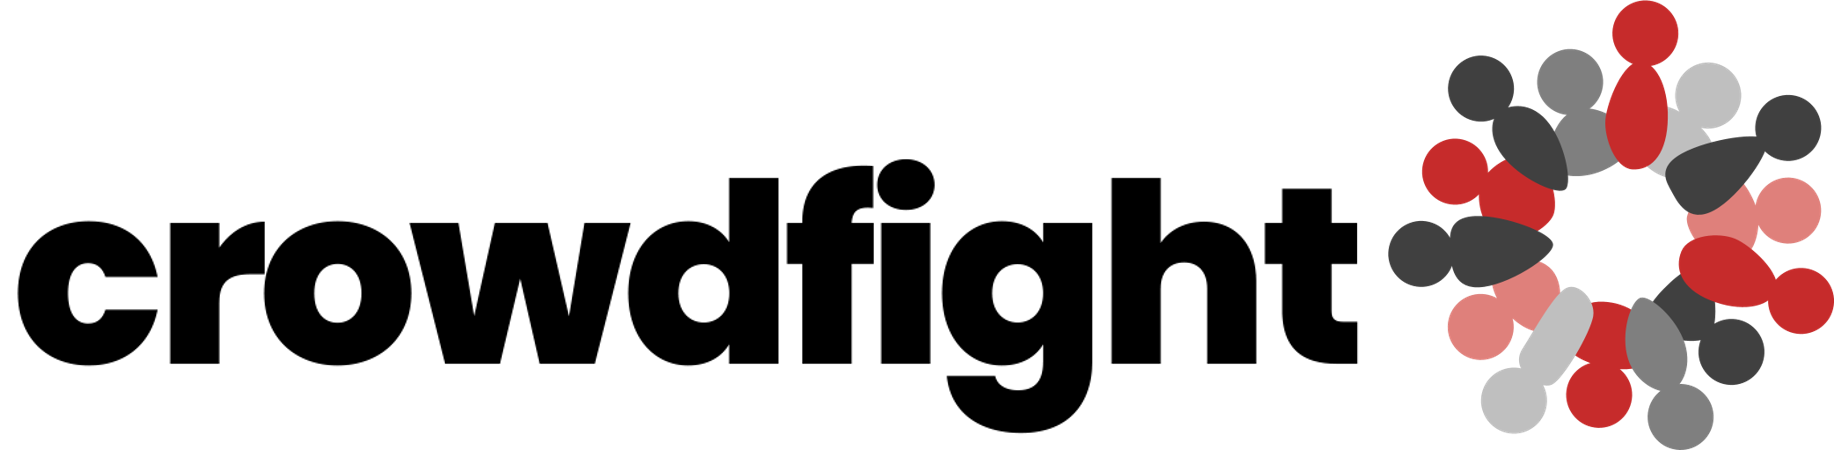 Crowdfight logo